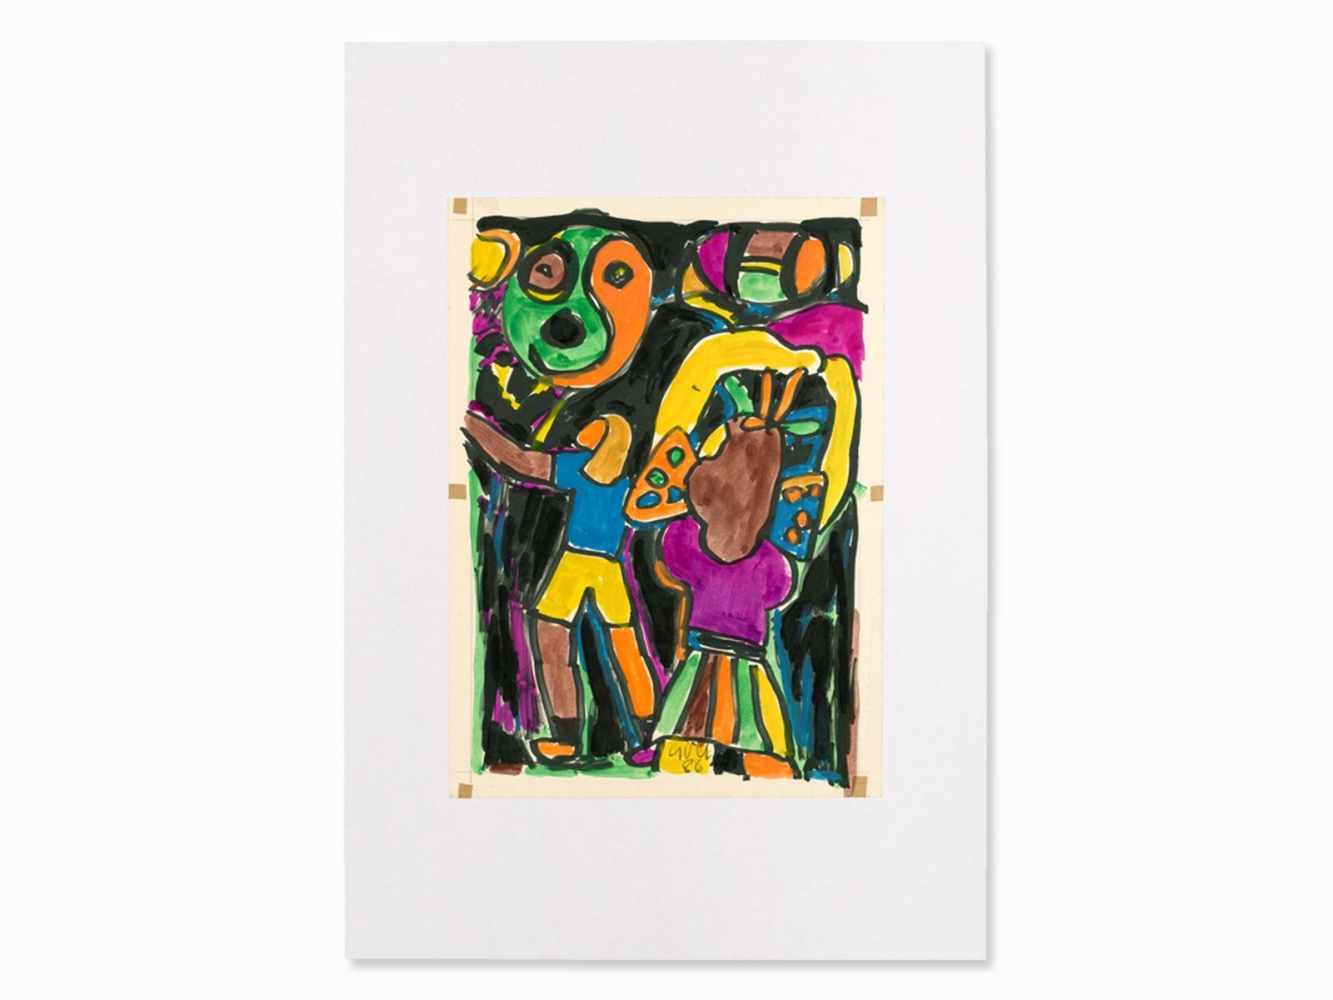 Miklos Németh, Mixed Media, Colorful Composition, Hungary, ´86<b